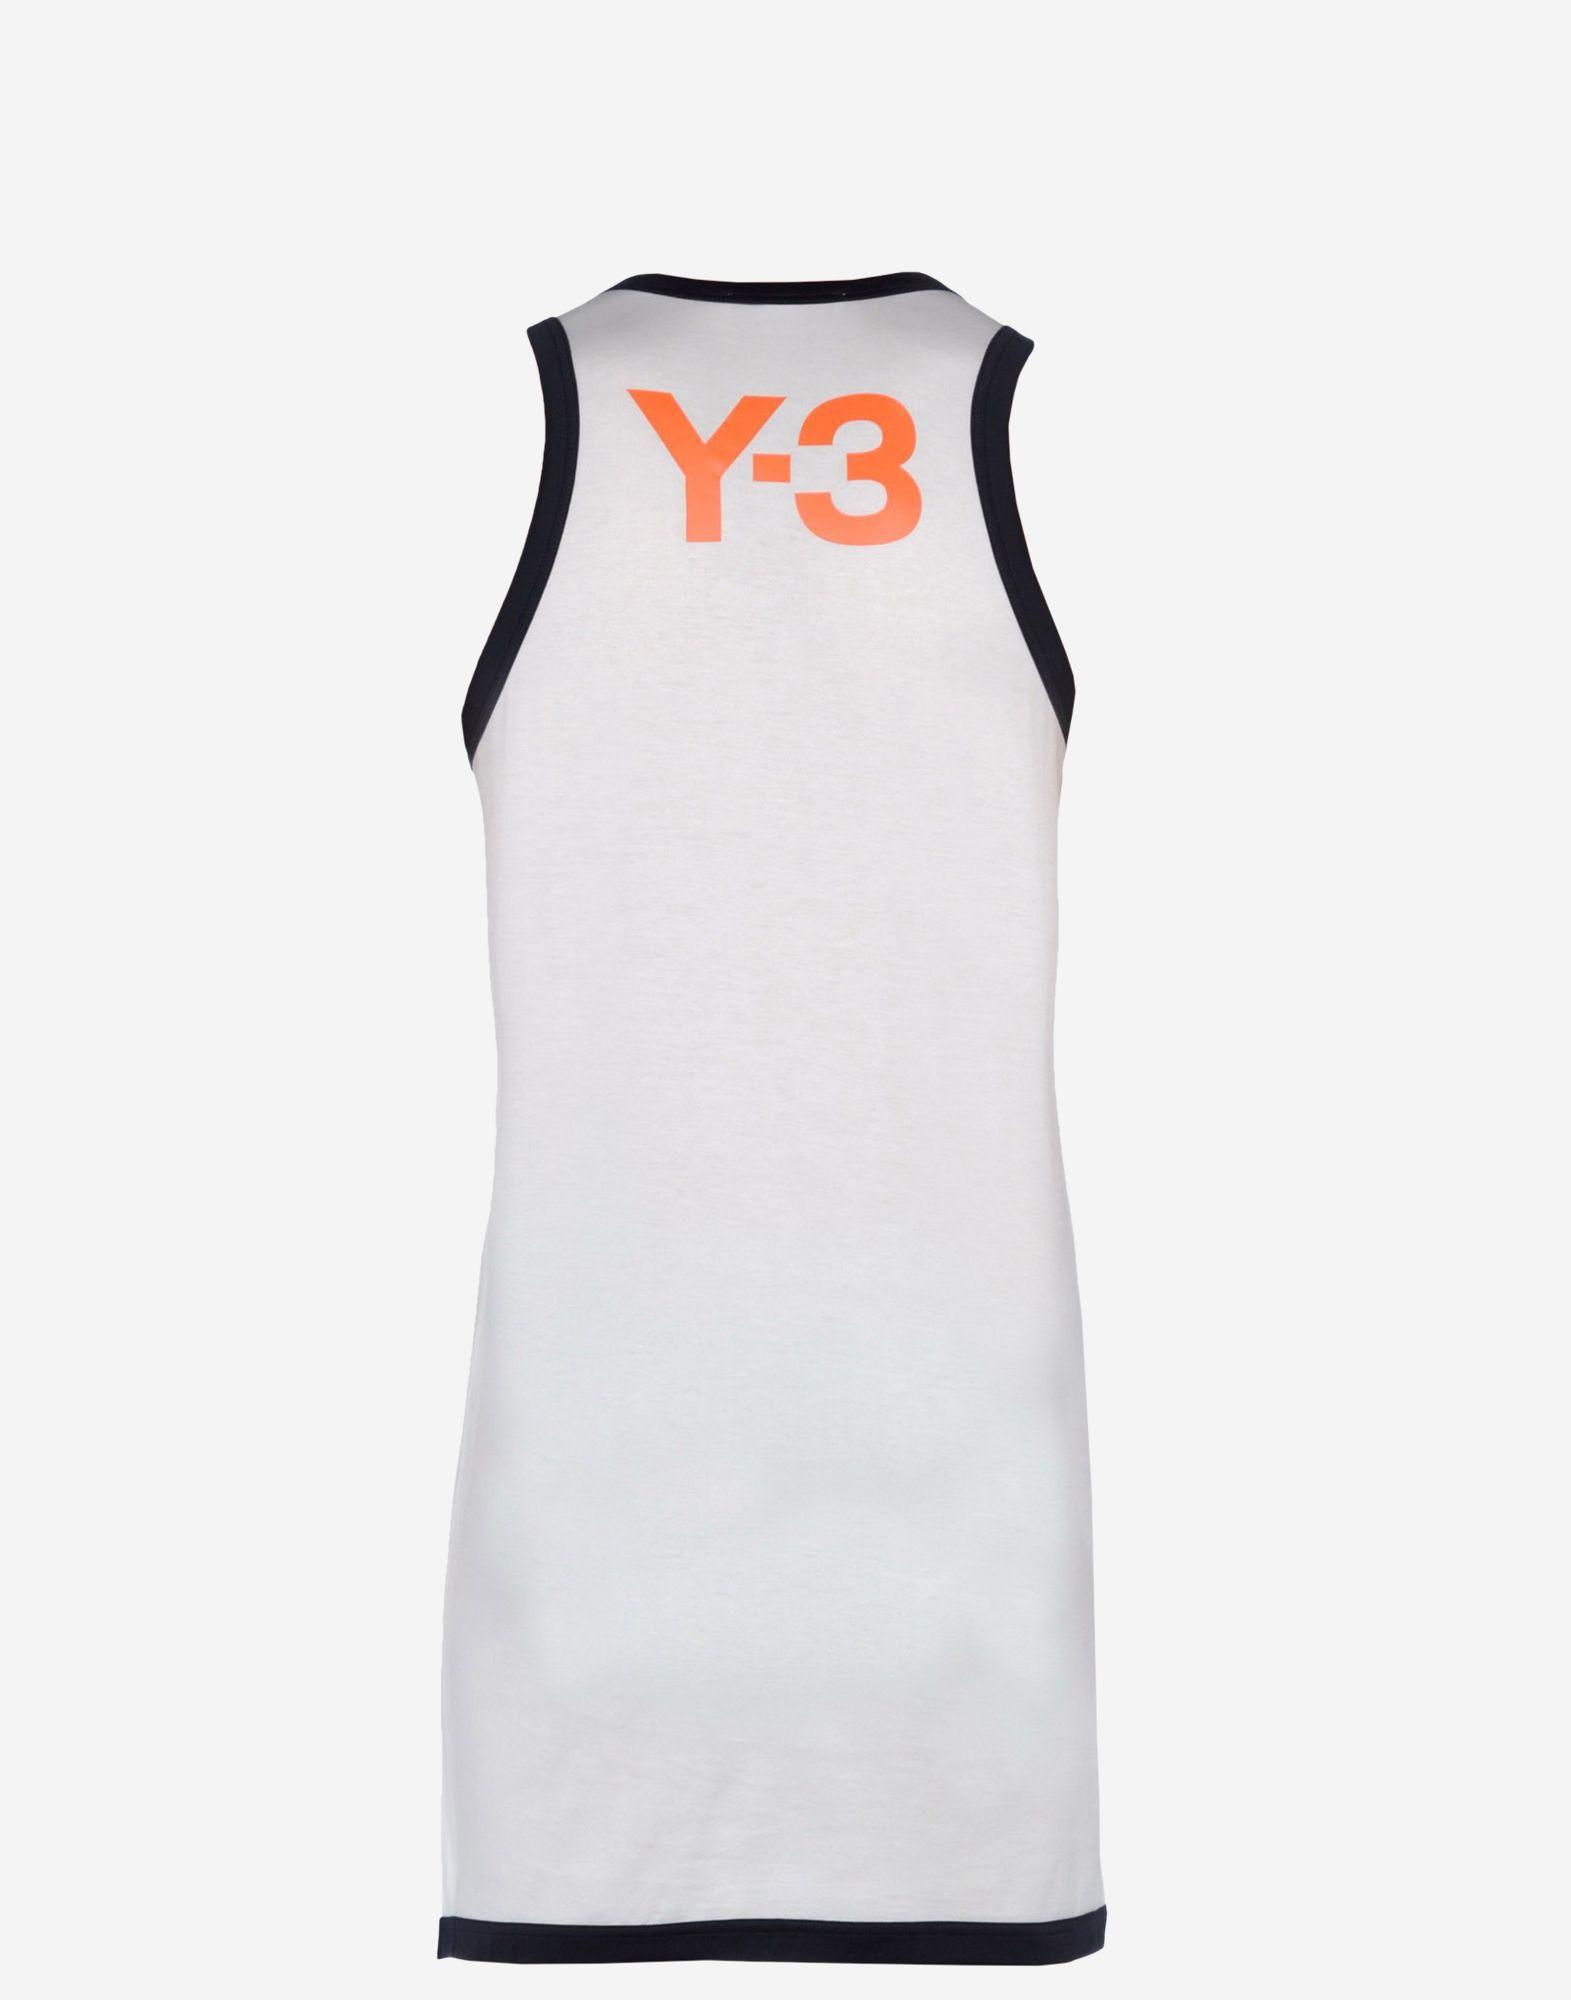 Y 3 Basketball Shirt Sleeveless T Shirts Adidas Y 3